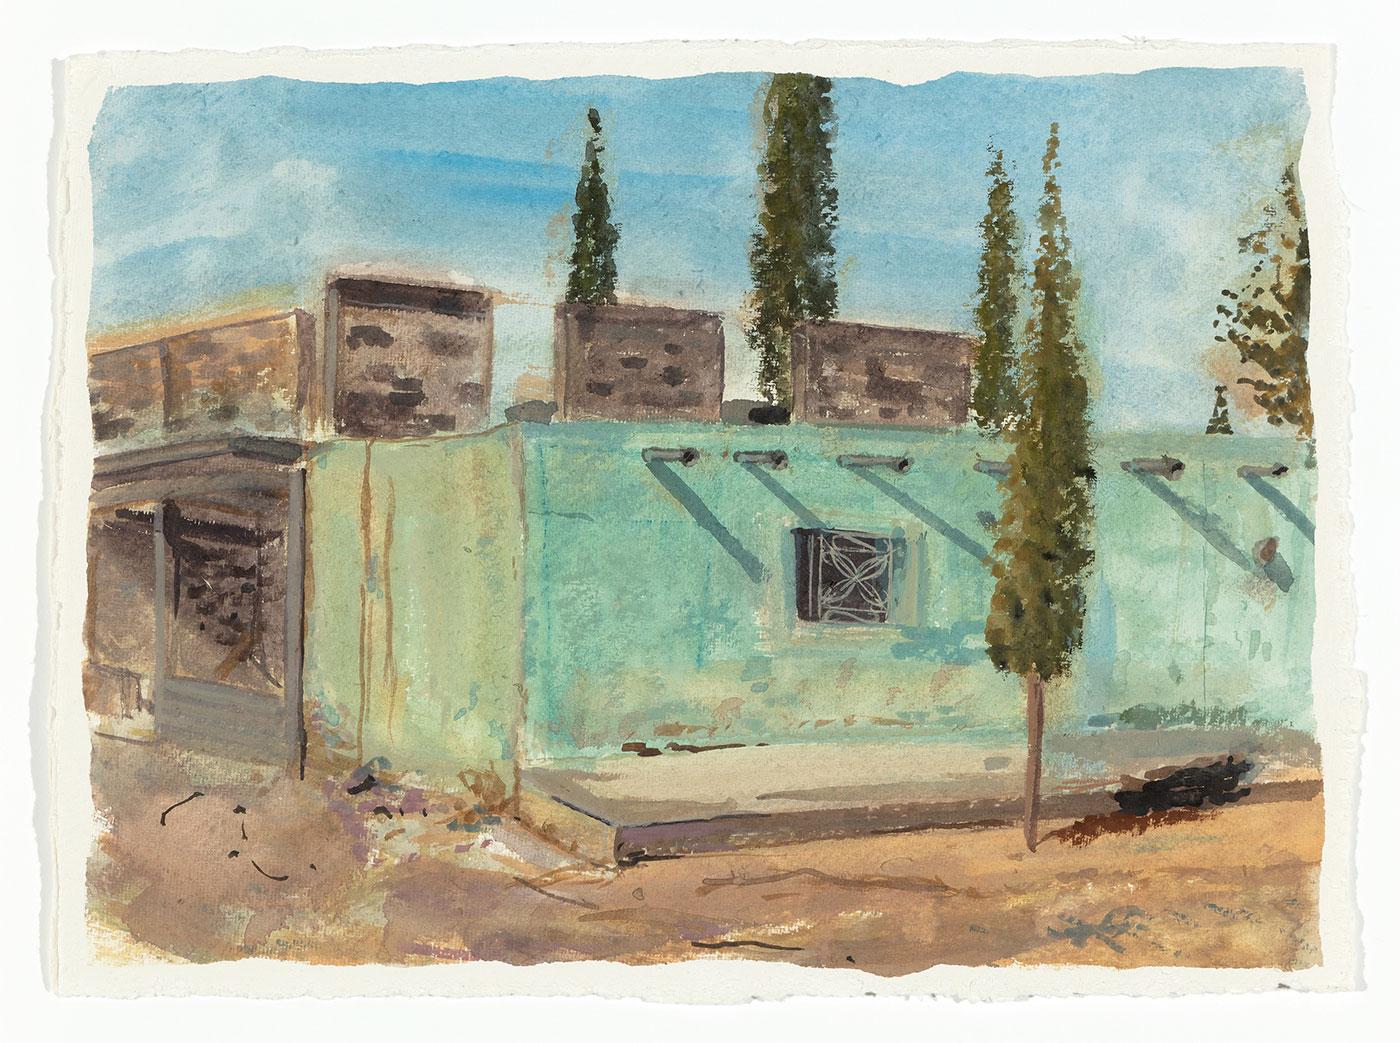 Nicolás González - La Casa de Mi Tío Moso (My Uncle Moso's House)